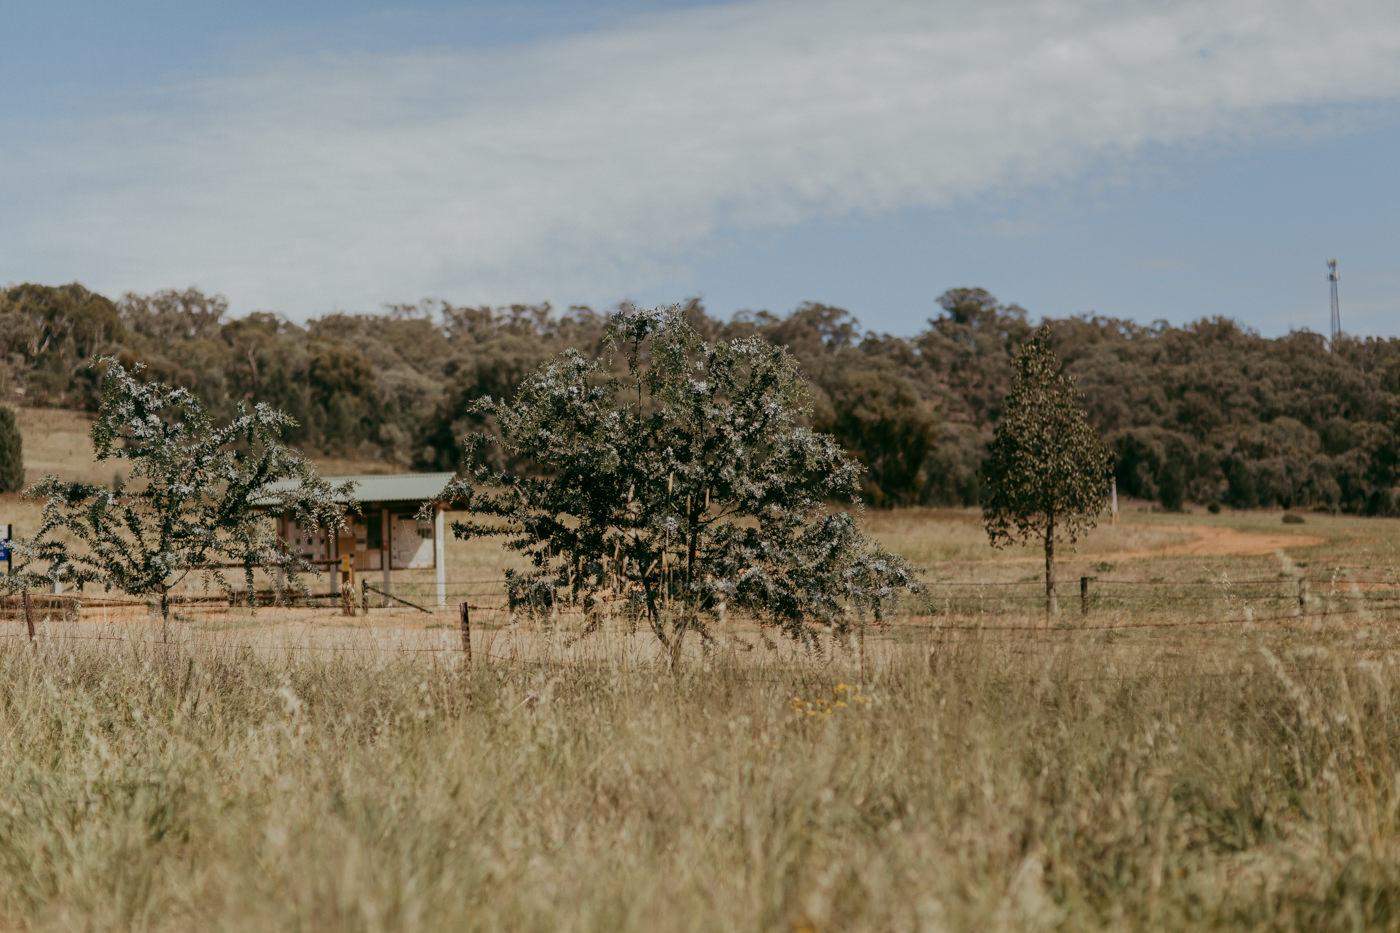 Anthony & Eliet - Wagga Wagga Wedding - Country NSW - Samantha Heather Photography-2.jpg